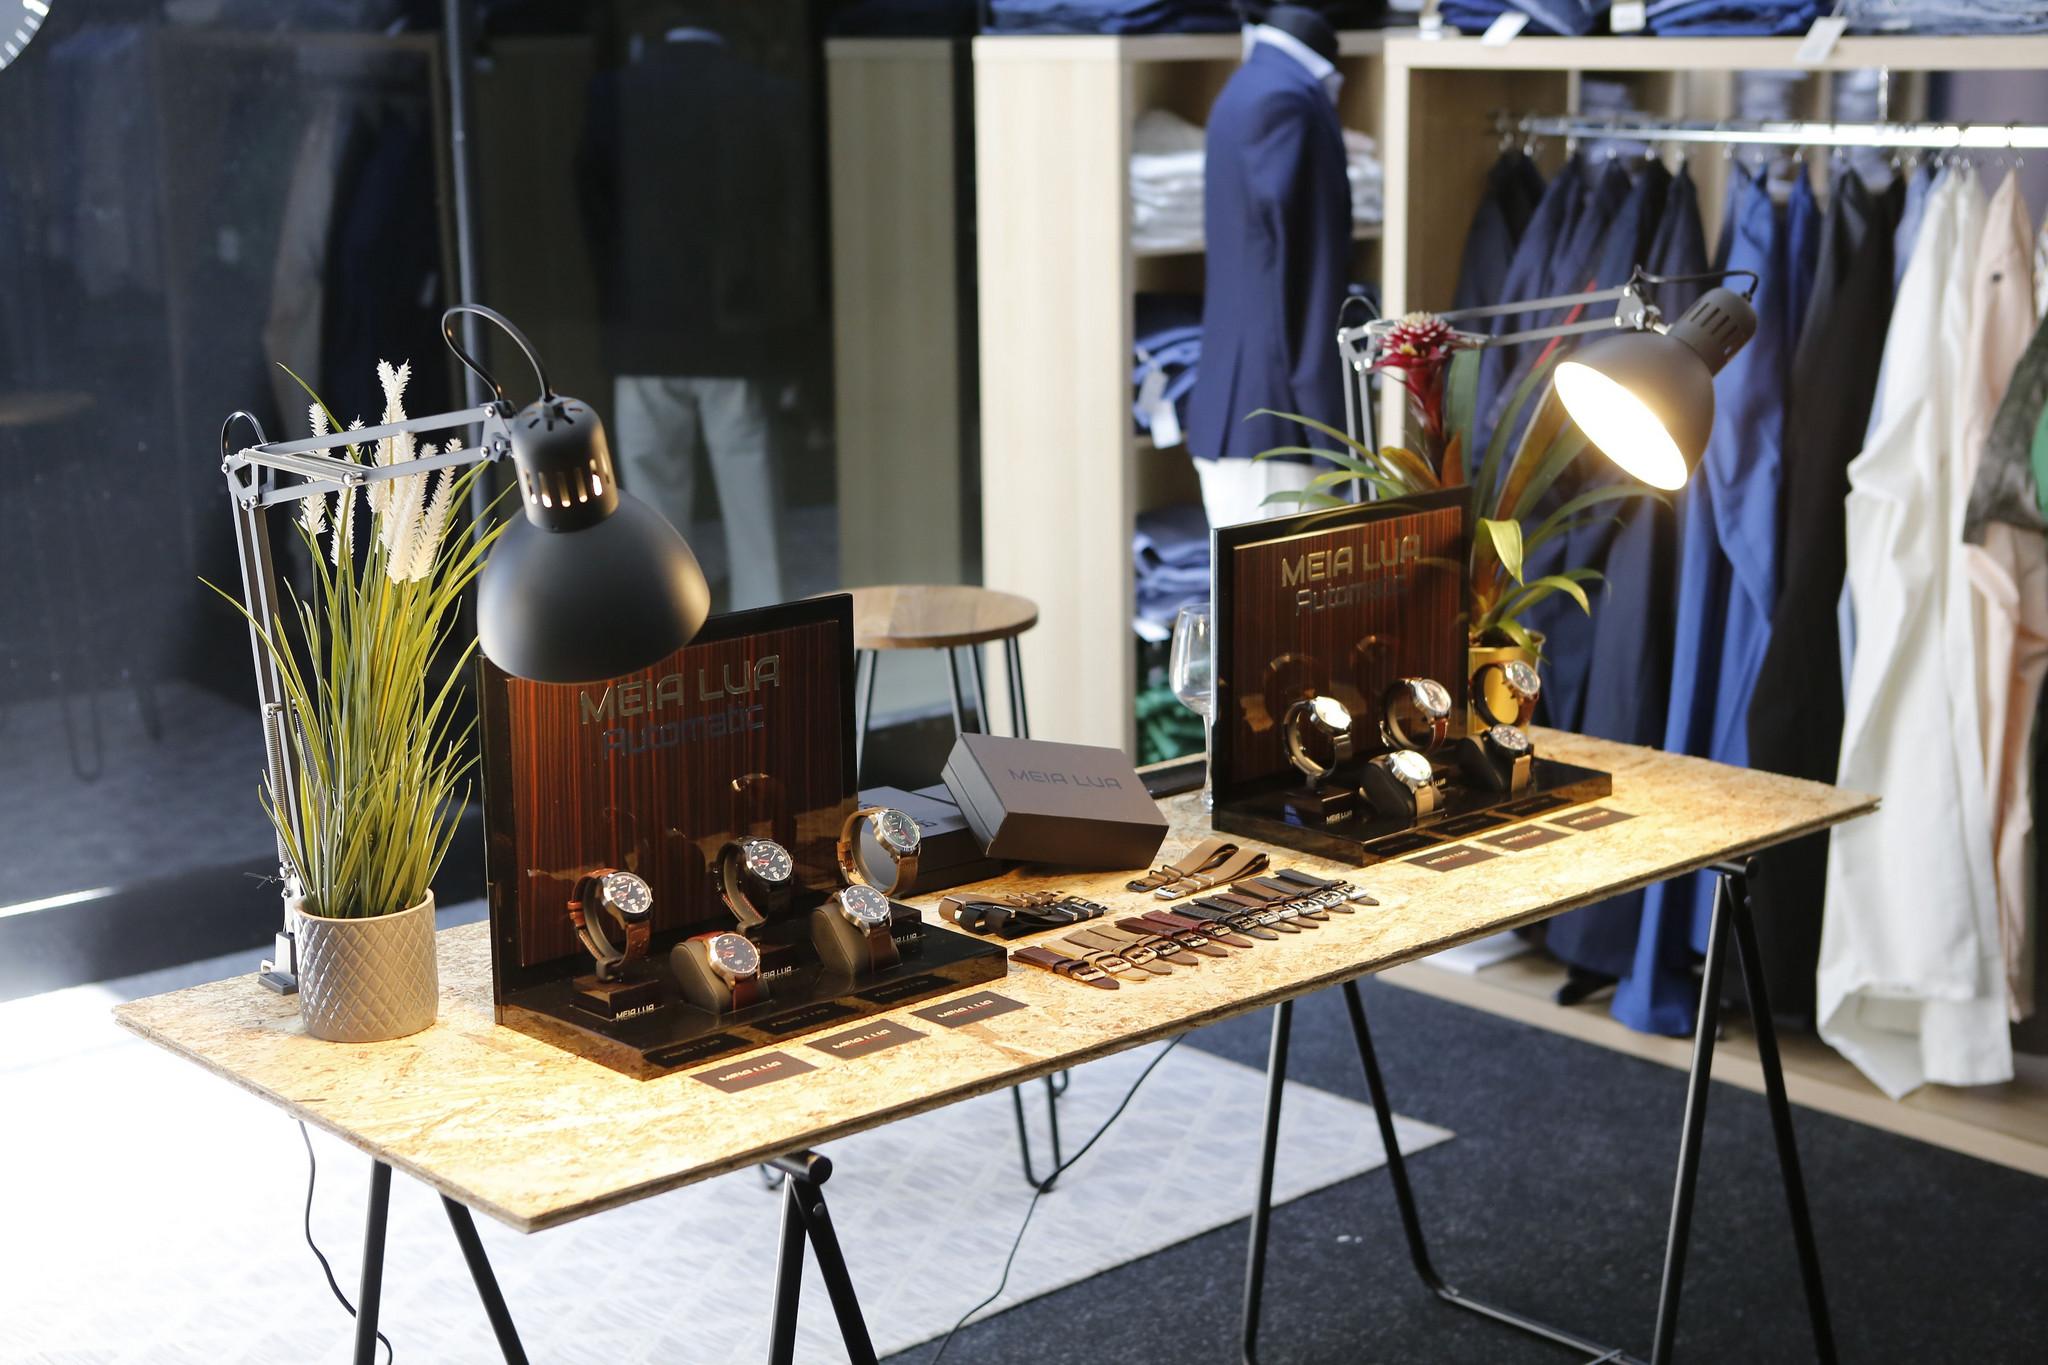 The Gentlemen's Market & Bons Rapazes_Meia Lua.JPG